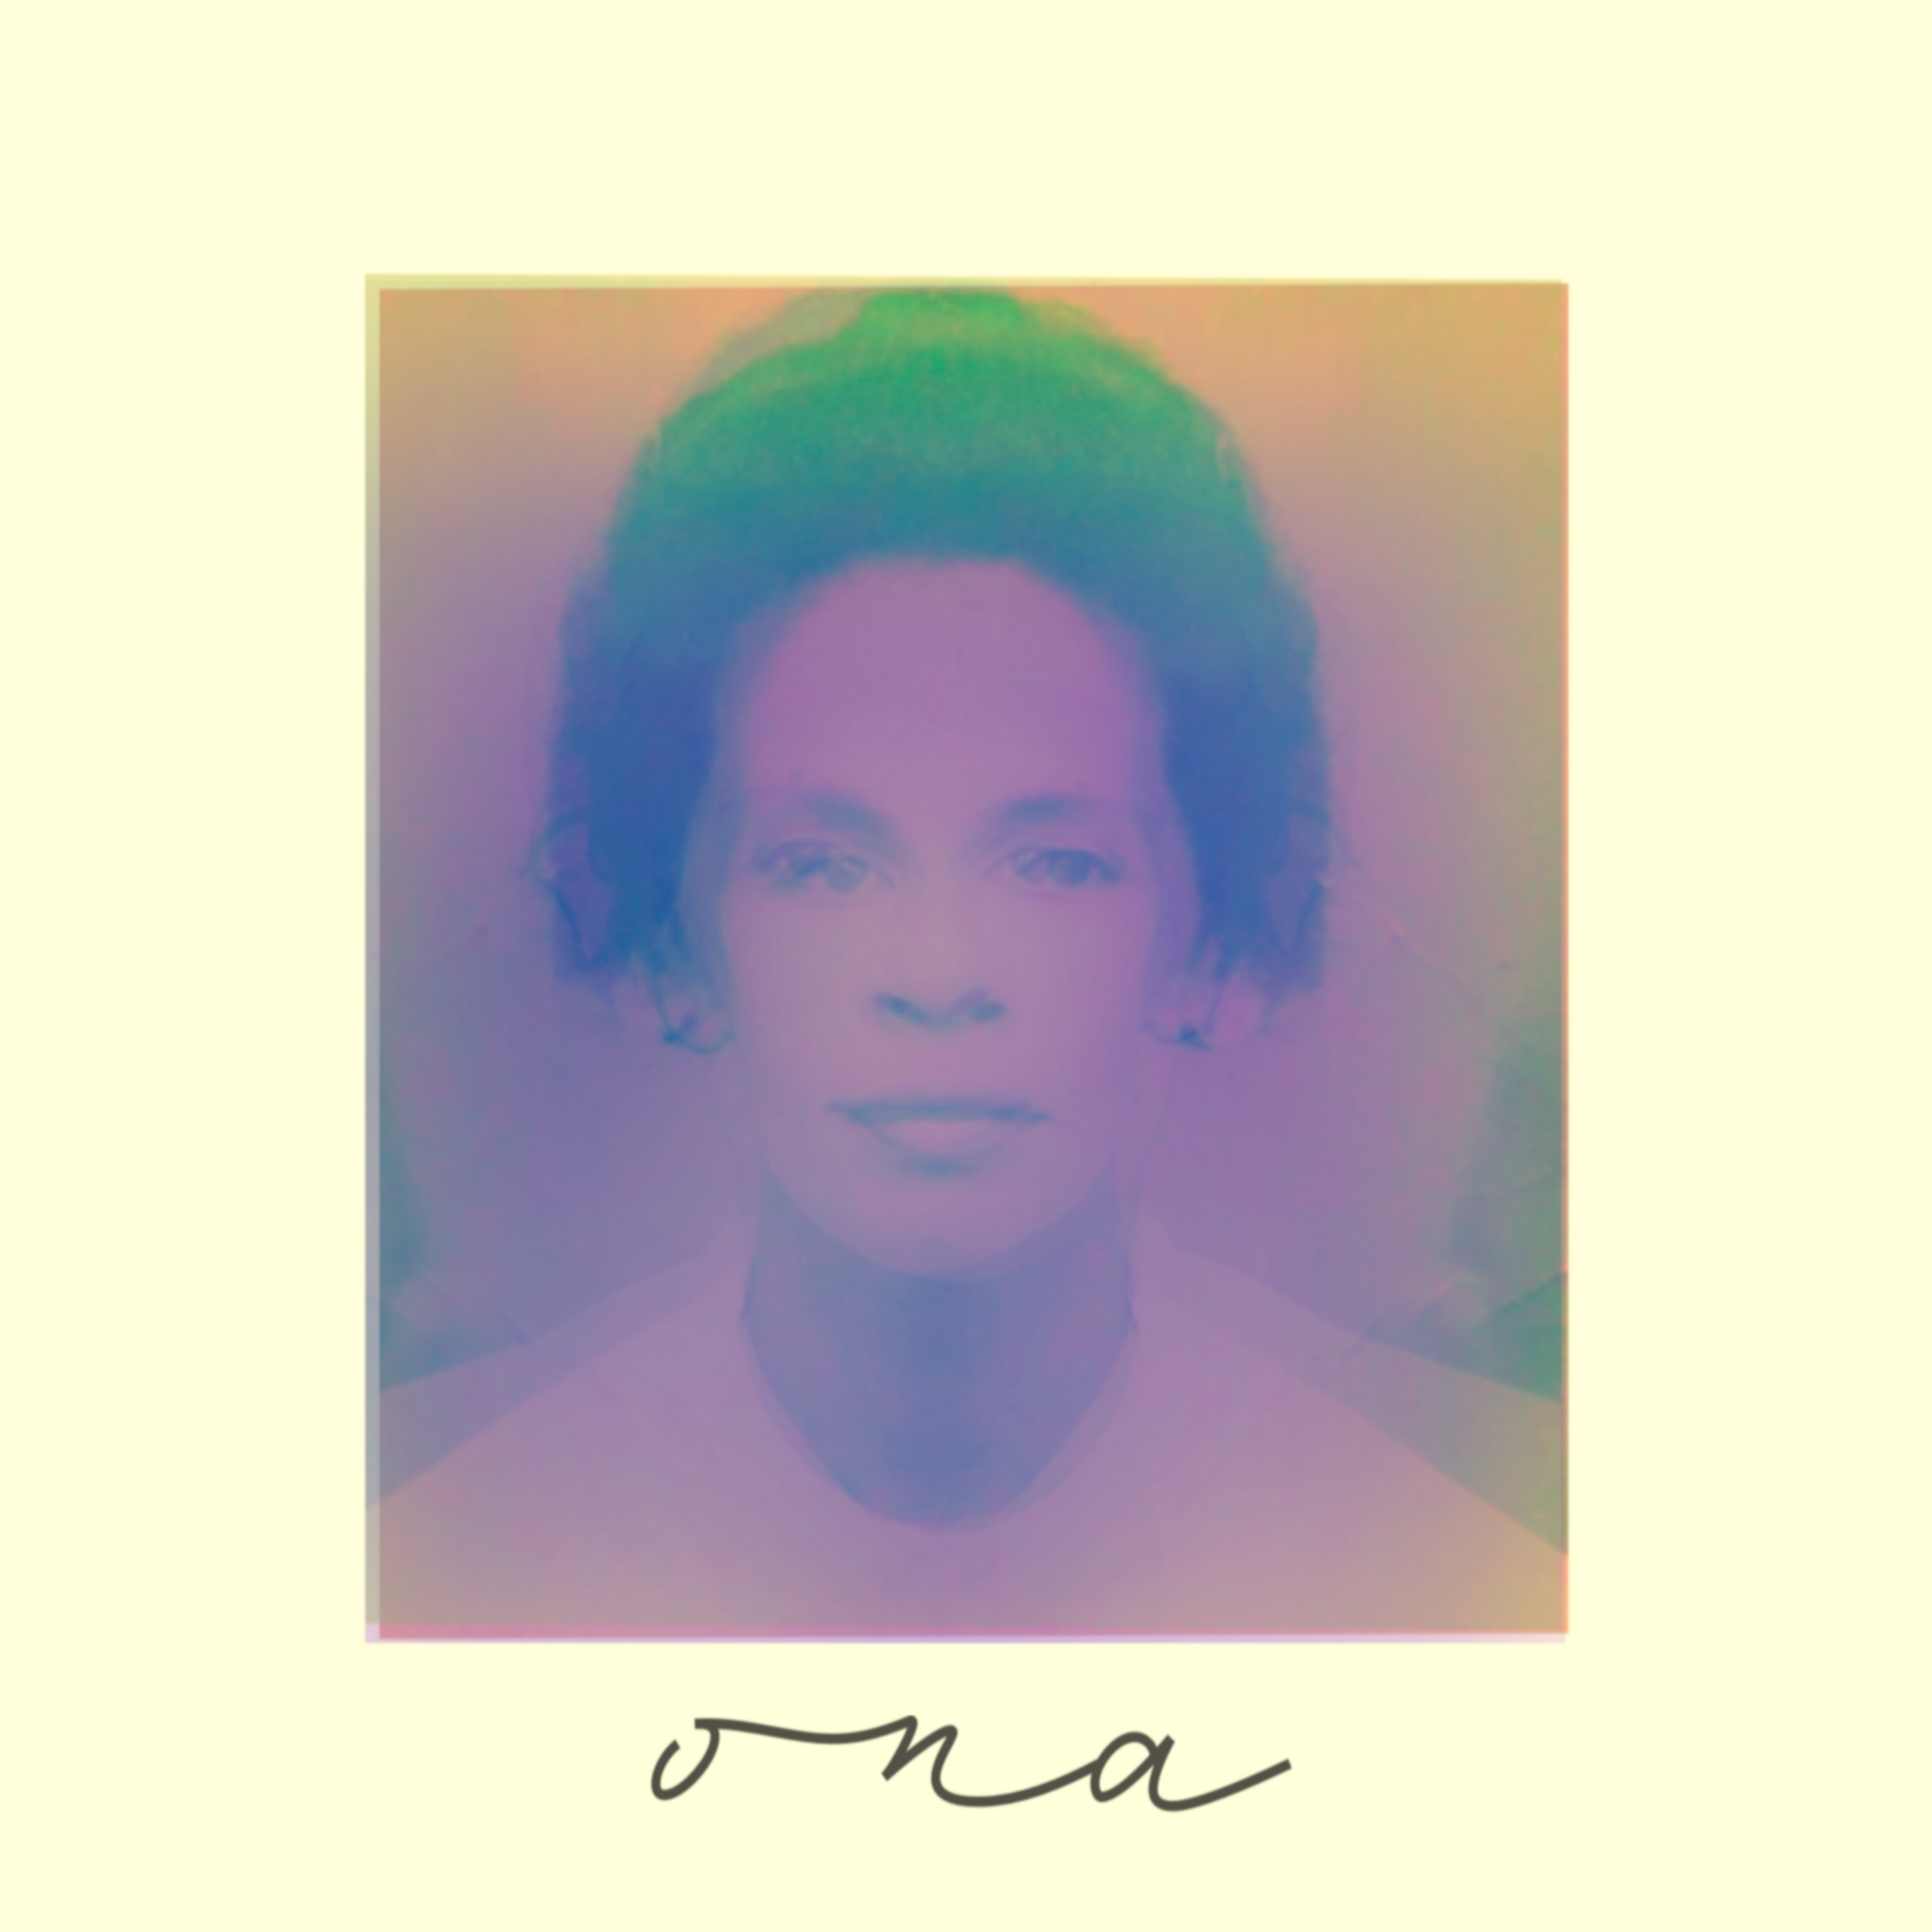 Jamila Silvera / ONA: Drums. Percussion - 2018